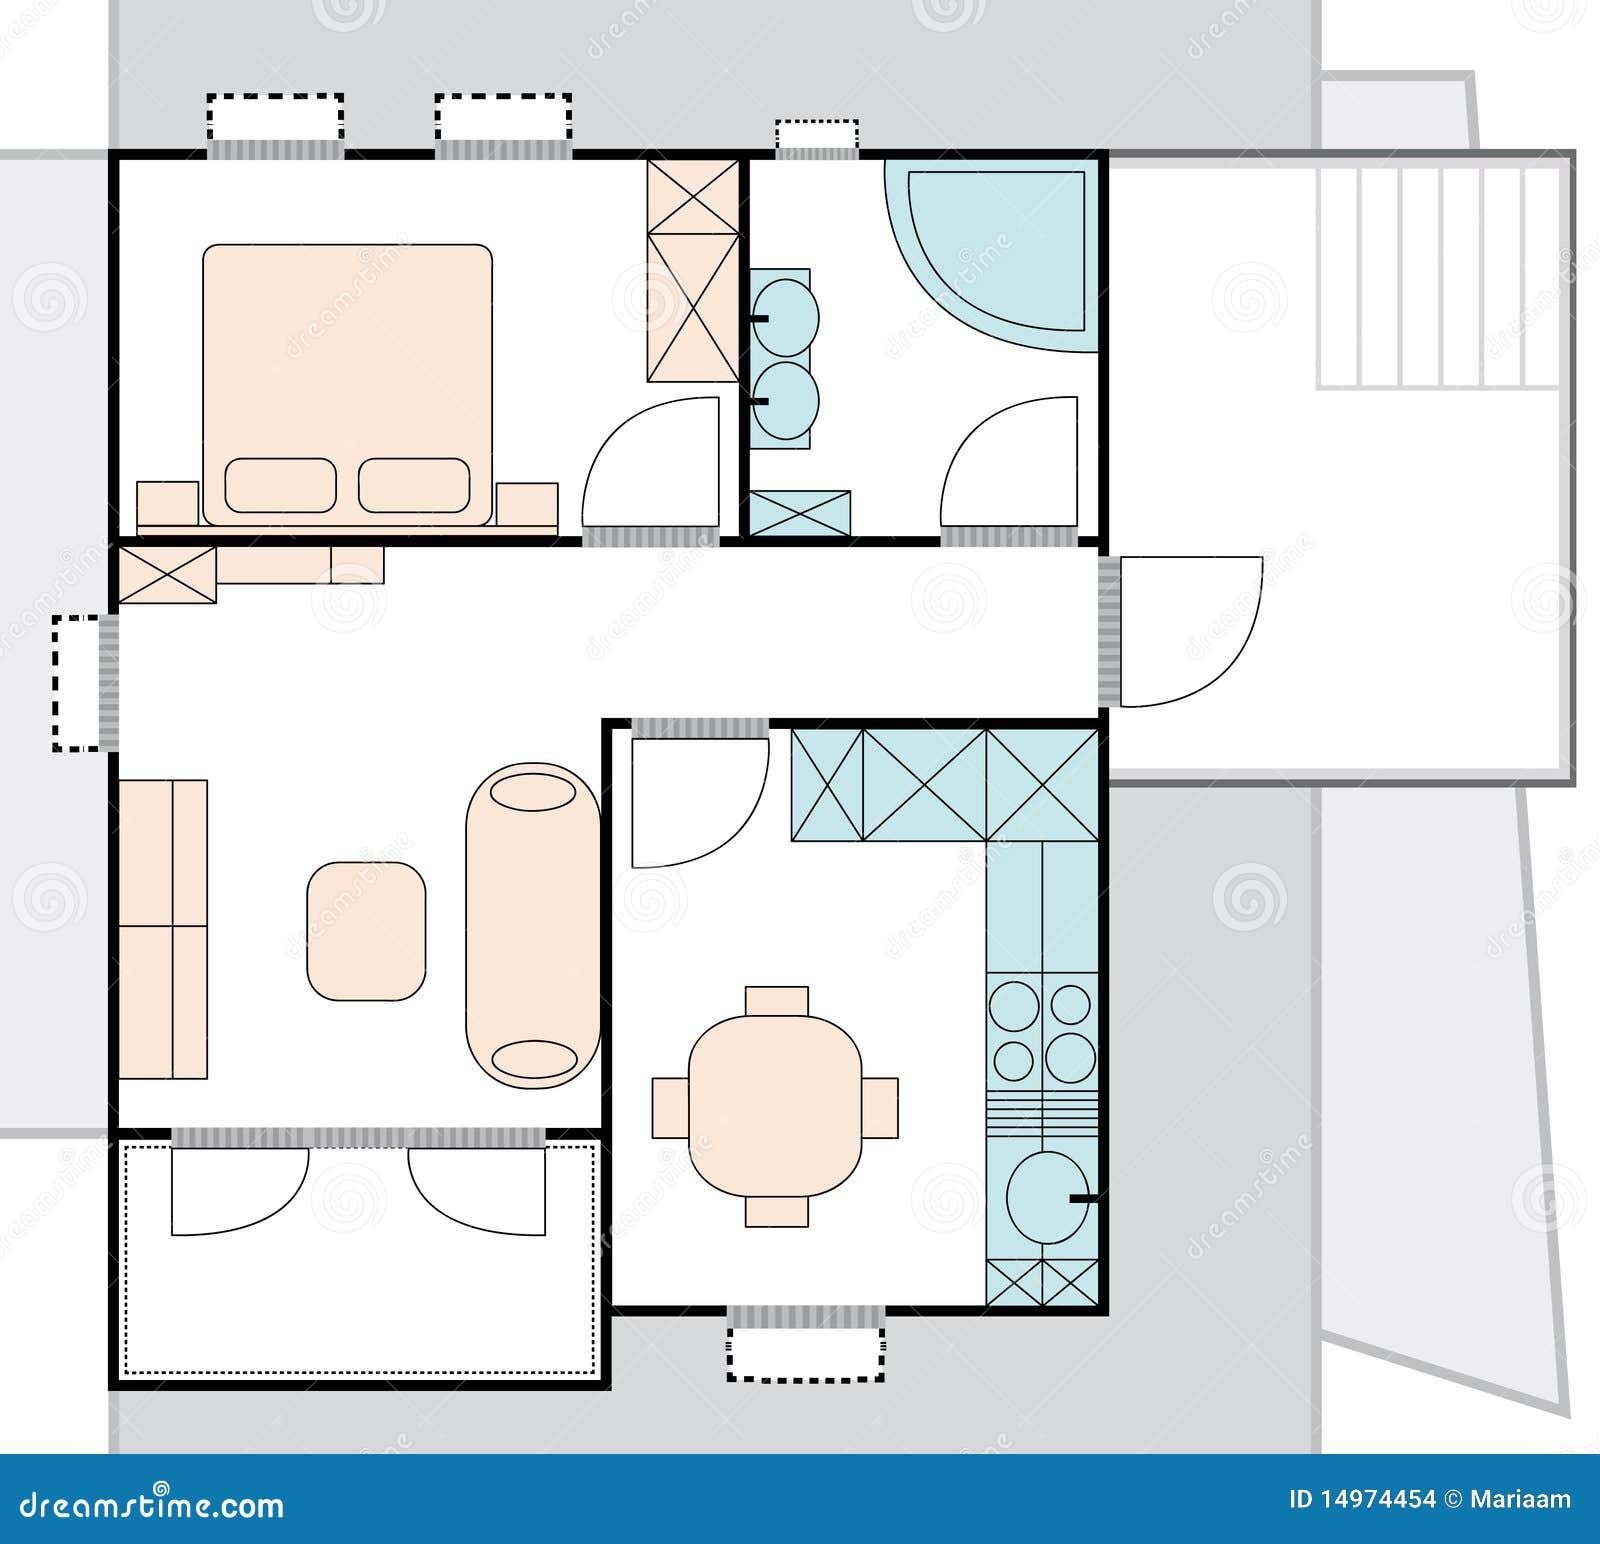 plan d 39 architecture d 39 appartement images stock image. Black Bedroom Furniture Sets. Home Design Ideas